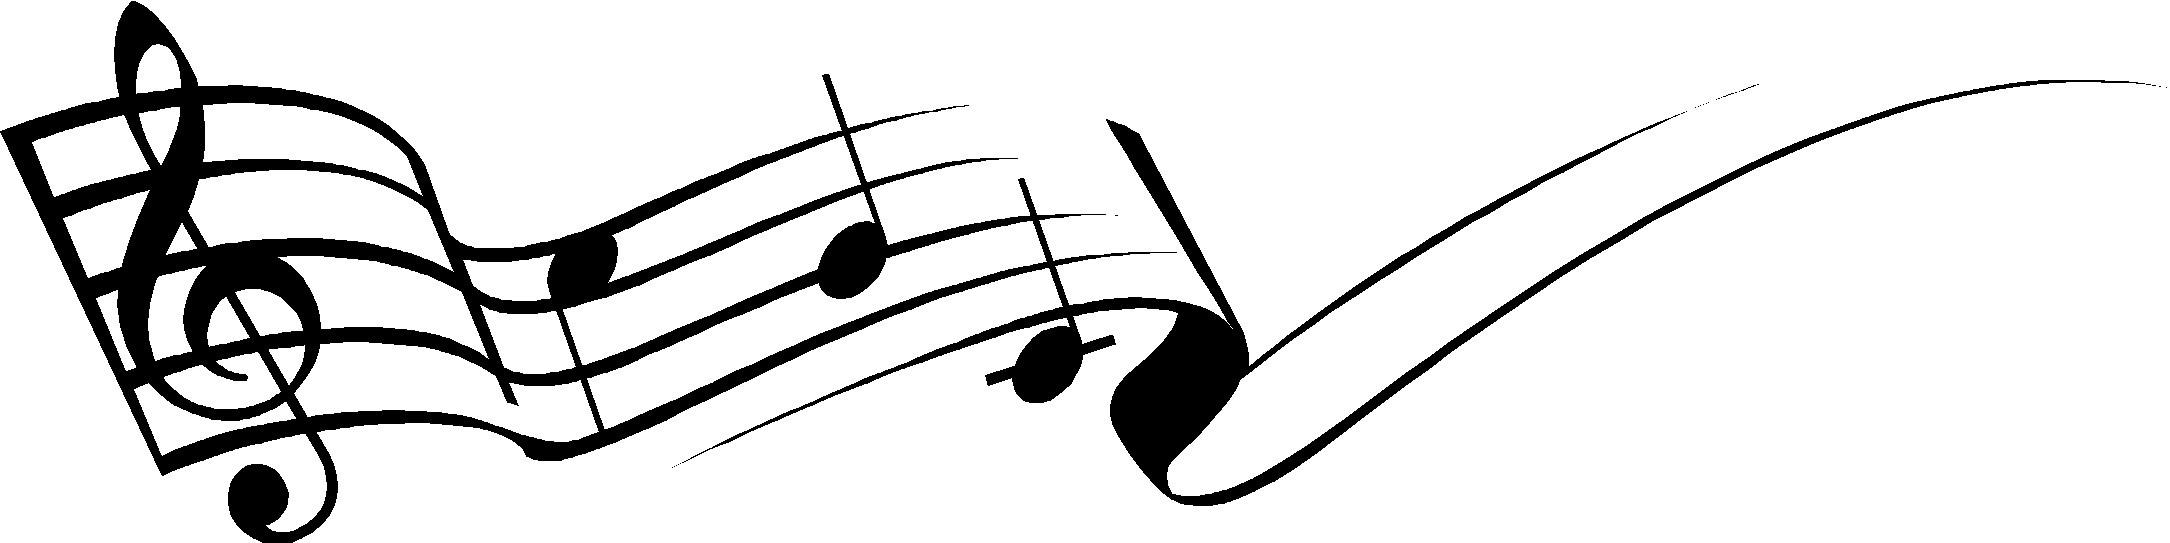 2170x543 Music Border Musical Borders Music Note Border Clipart